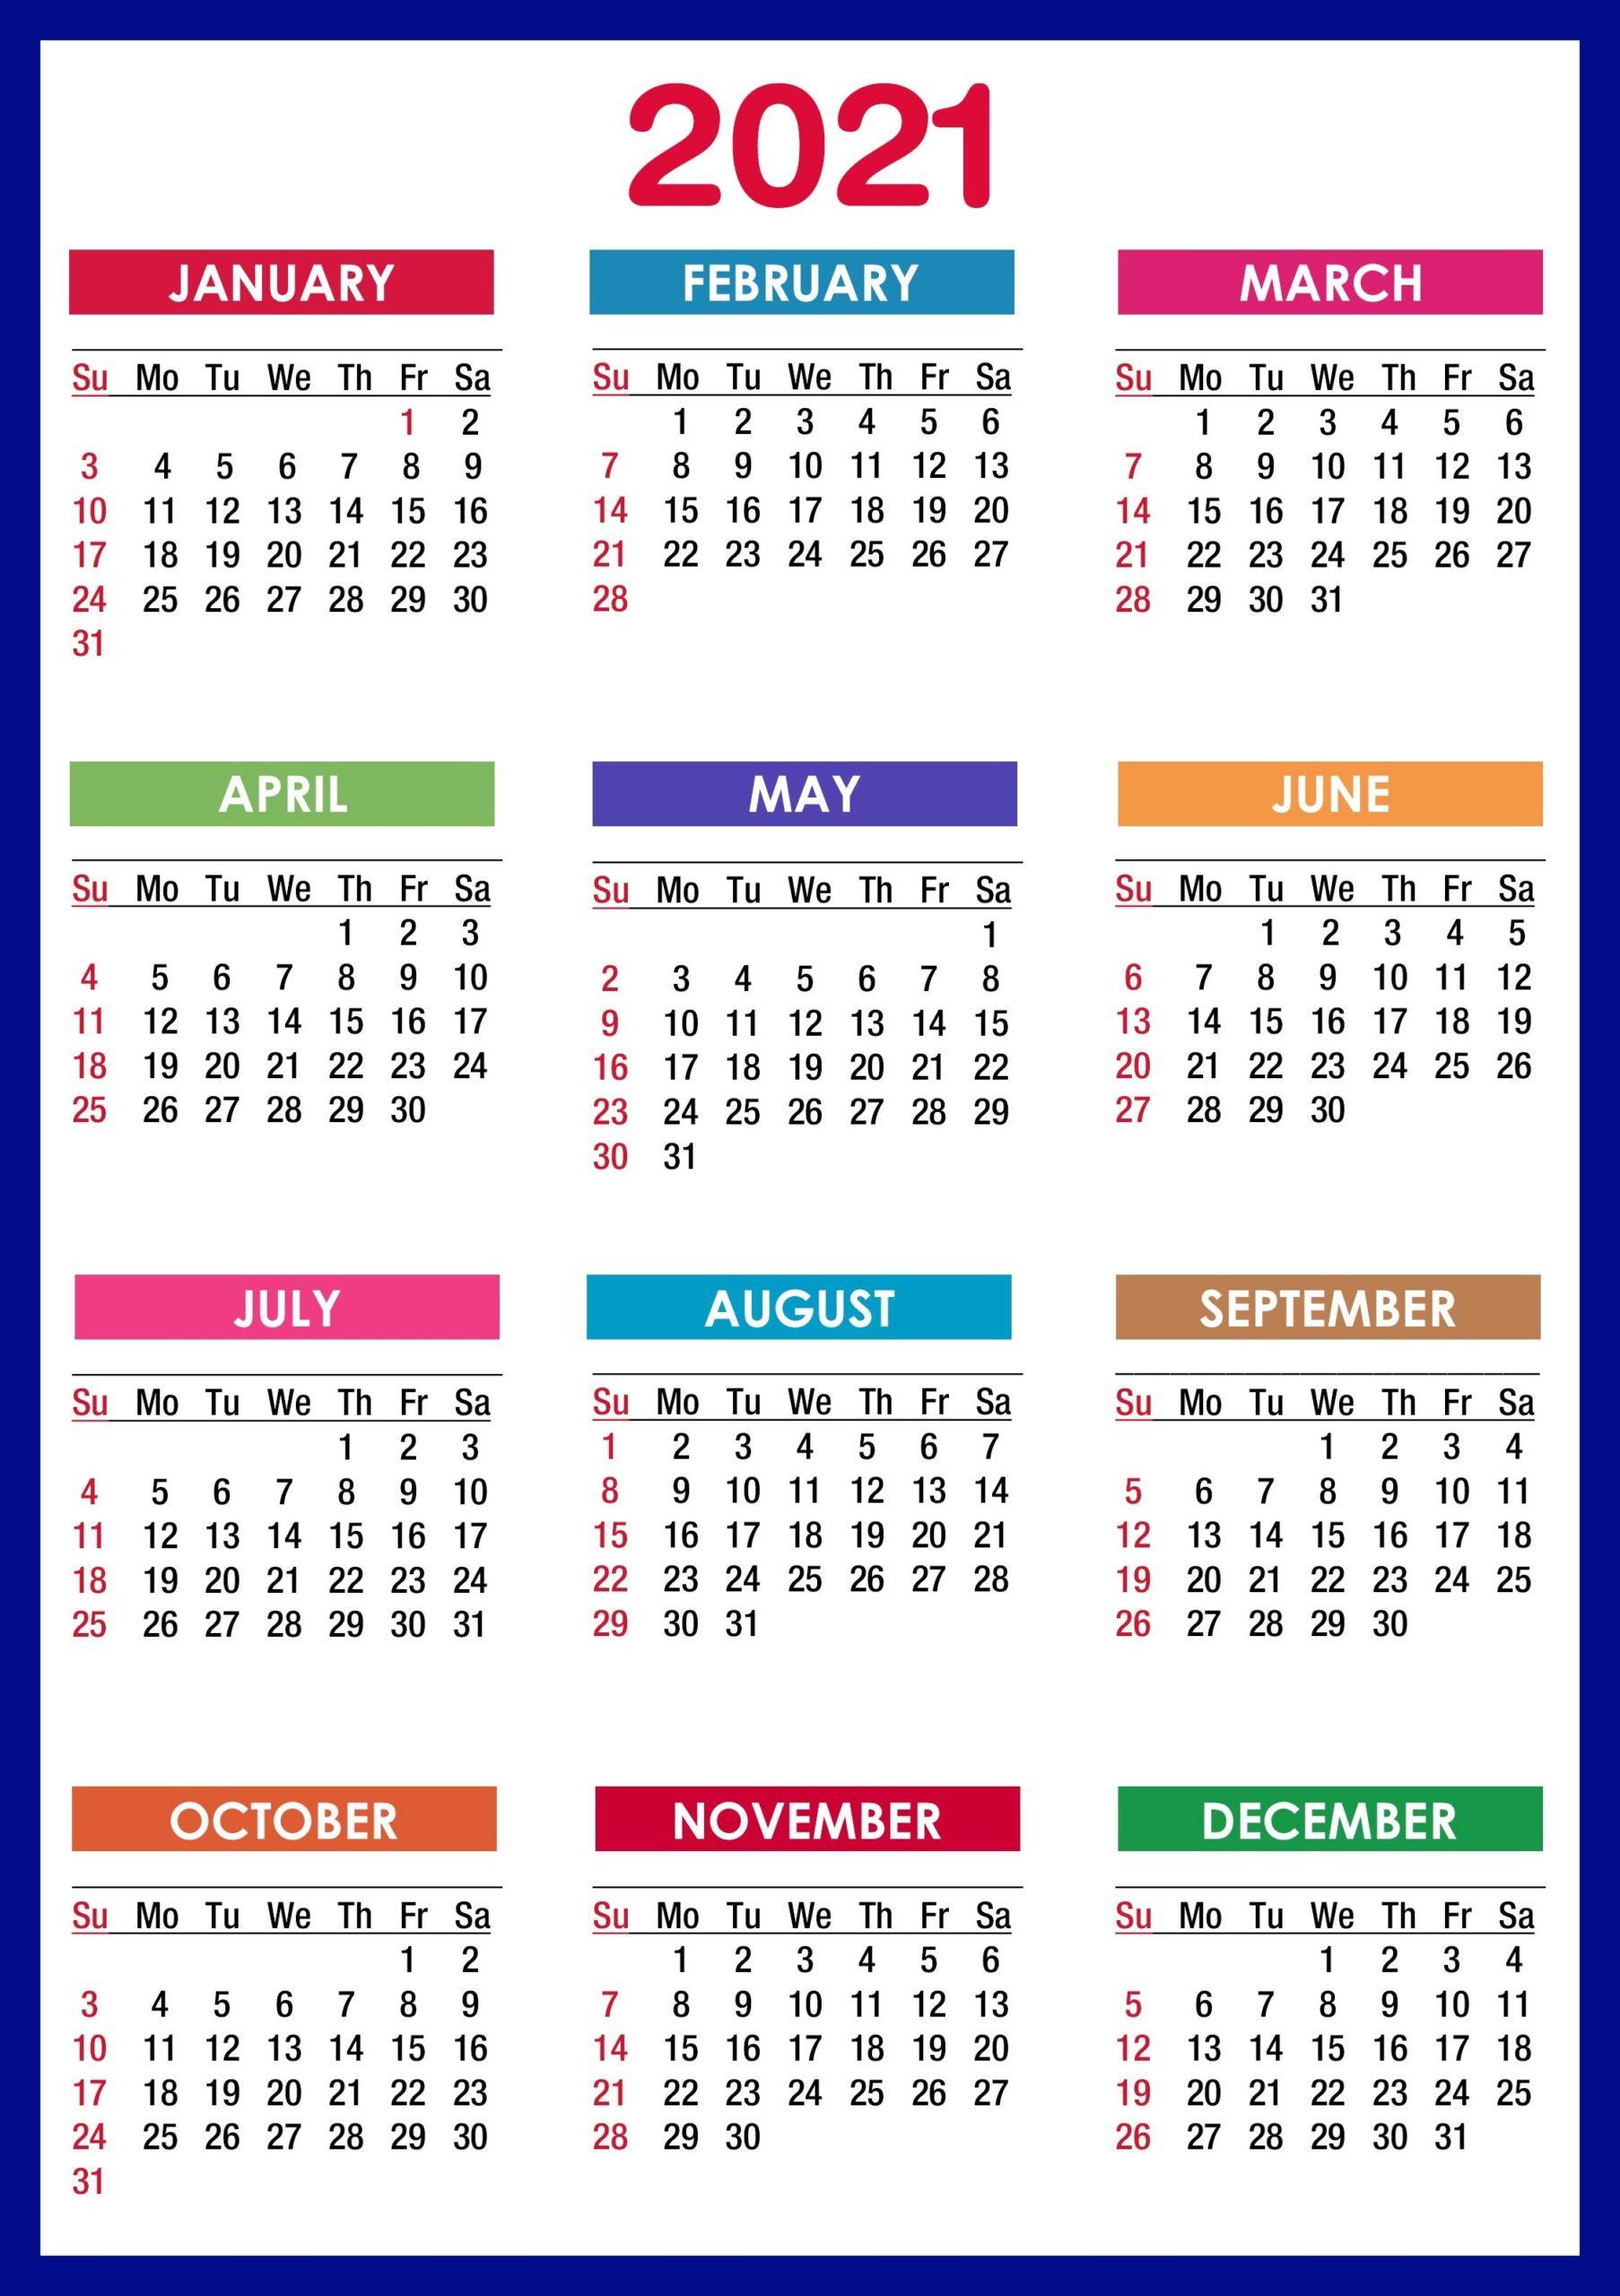 2021 Calendar Printable 12 Months All In One Calendar 2021